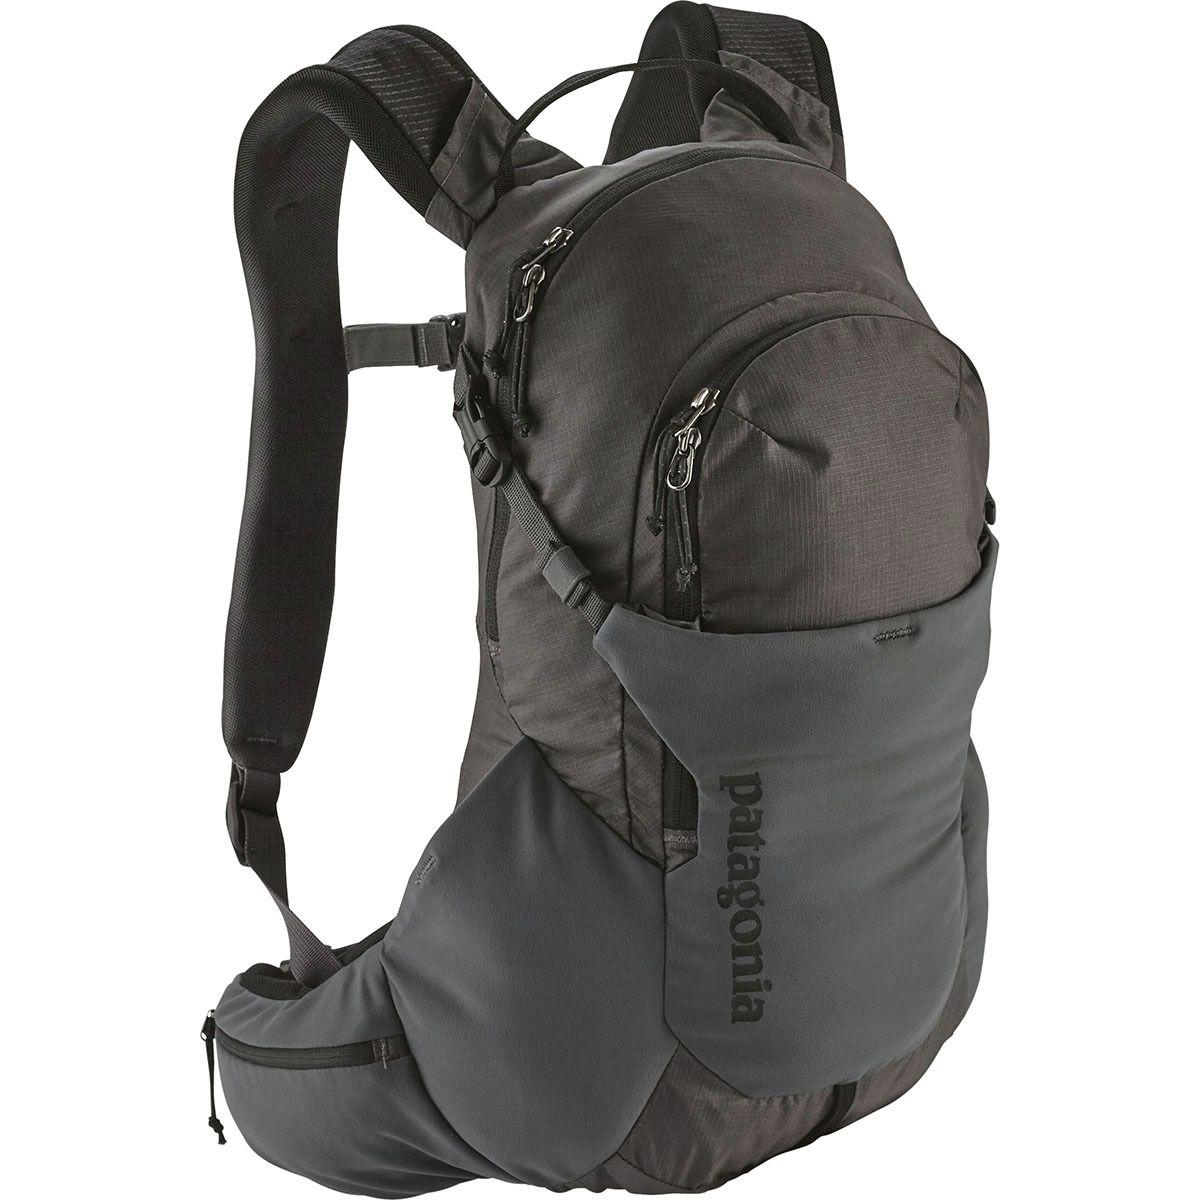 Patagonia Nine Trails Pack 14L